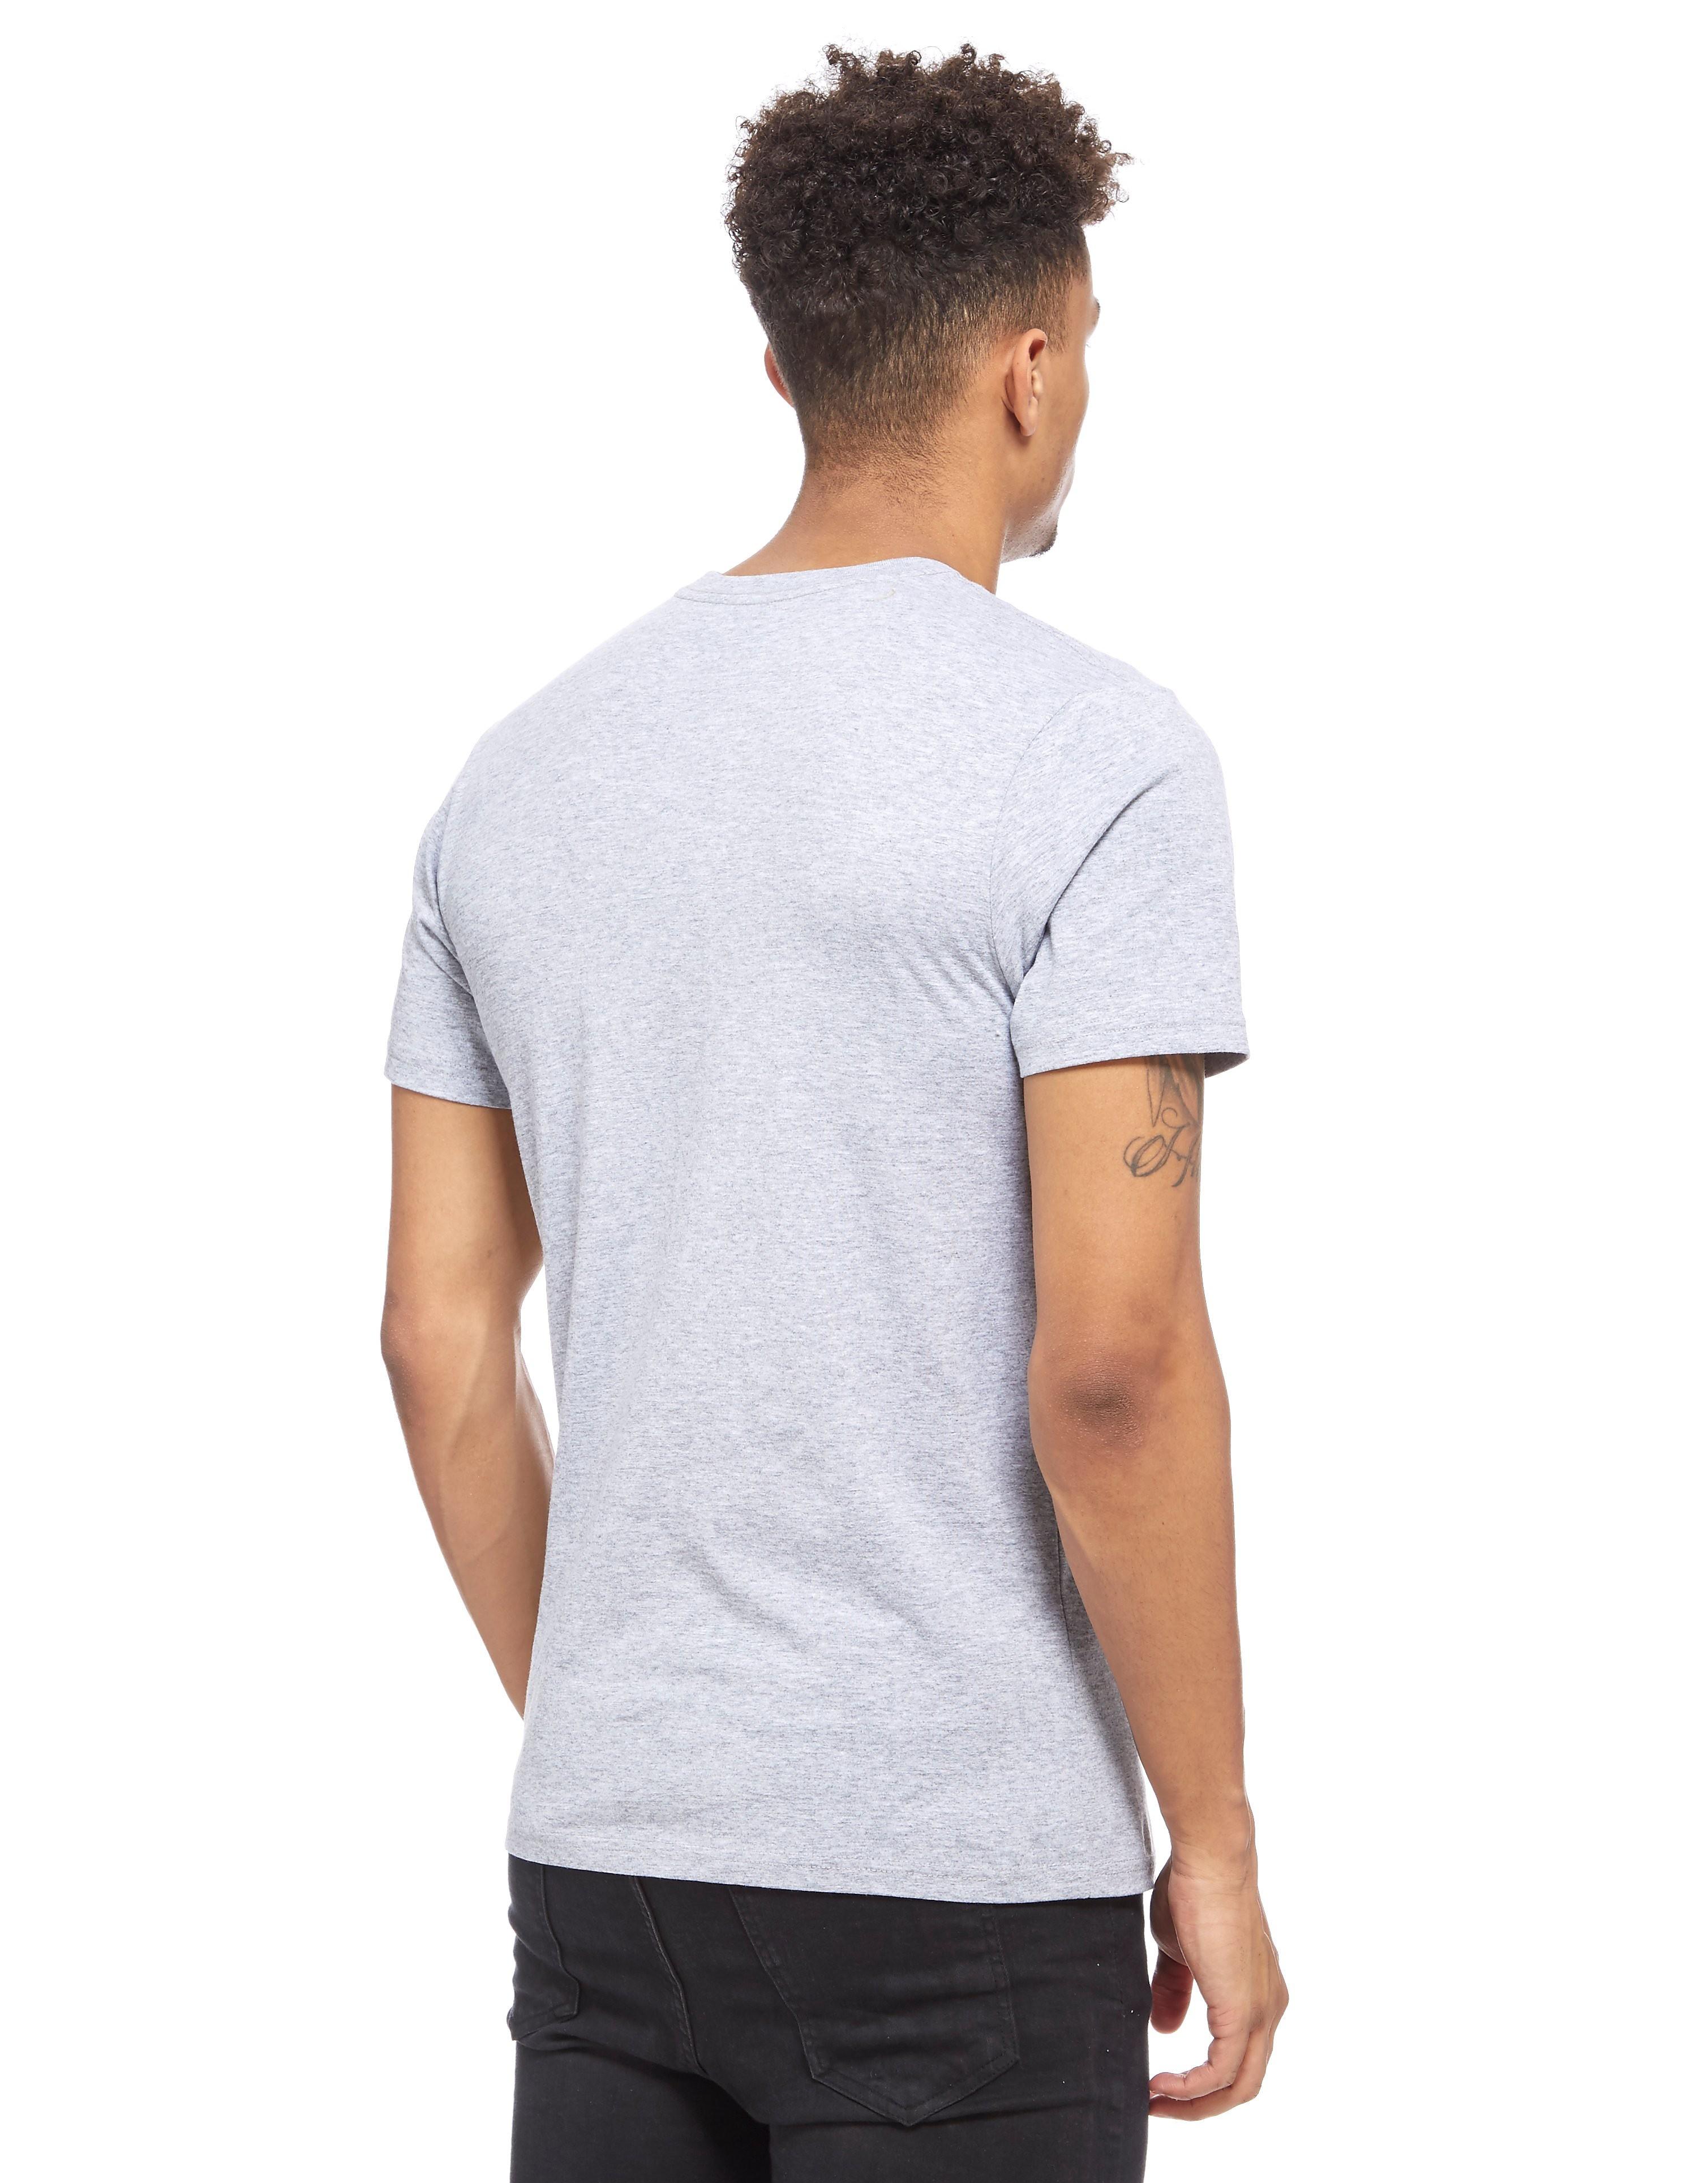 Vans California Native T-Shirt